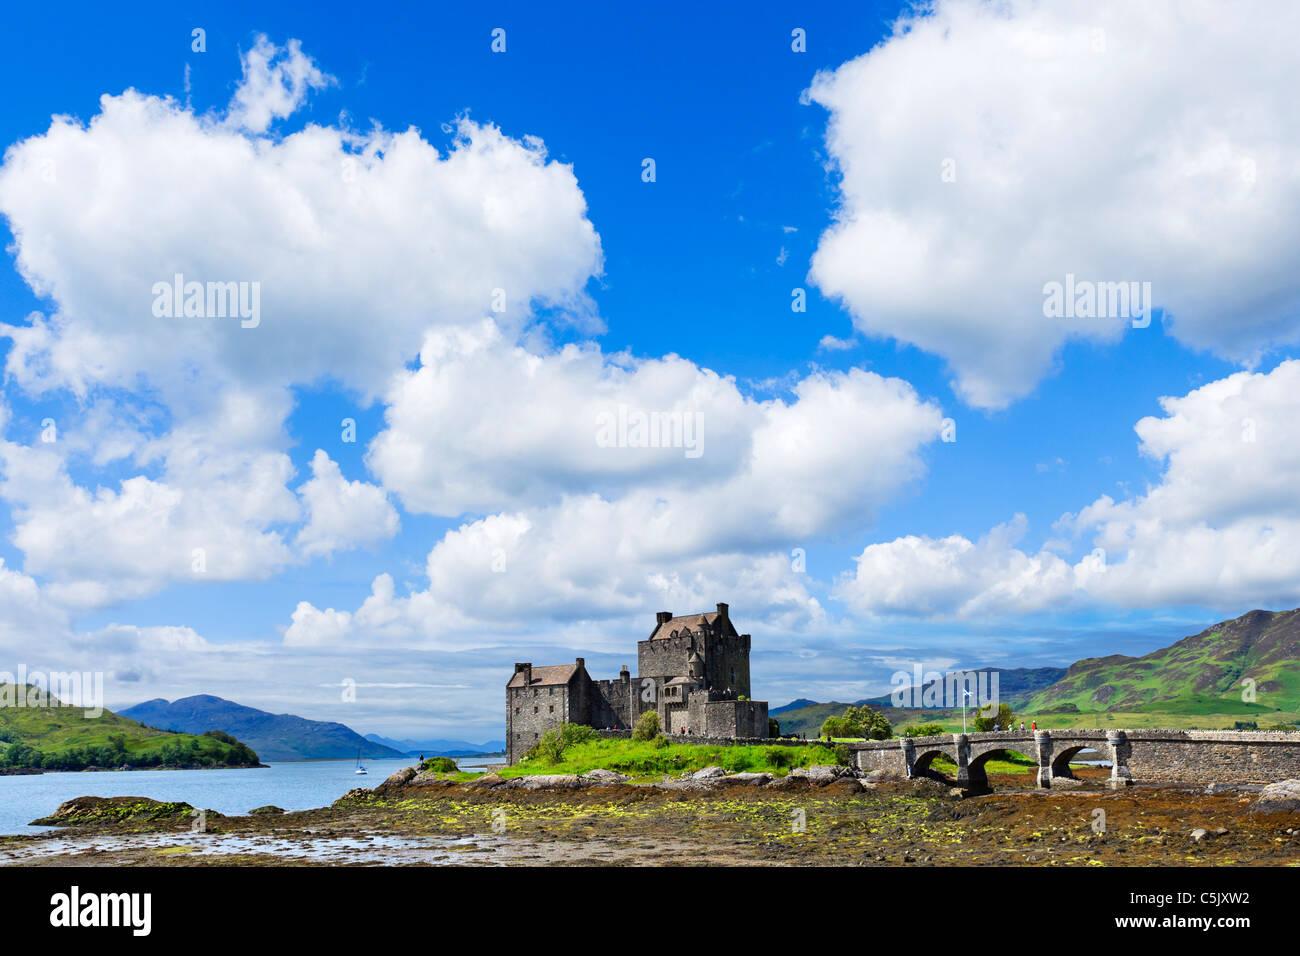 Blick Richtung Eilean Donan Castle, Loch Duich, Highland, Schottland, UK. Schottische Landschaft/Landschaften/Burgen Stockbild